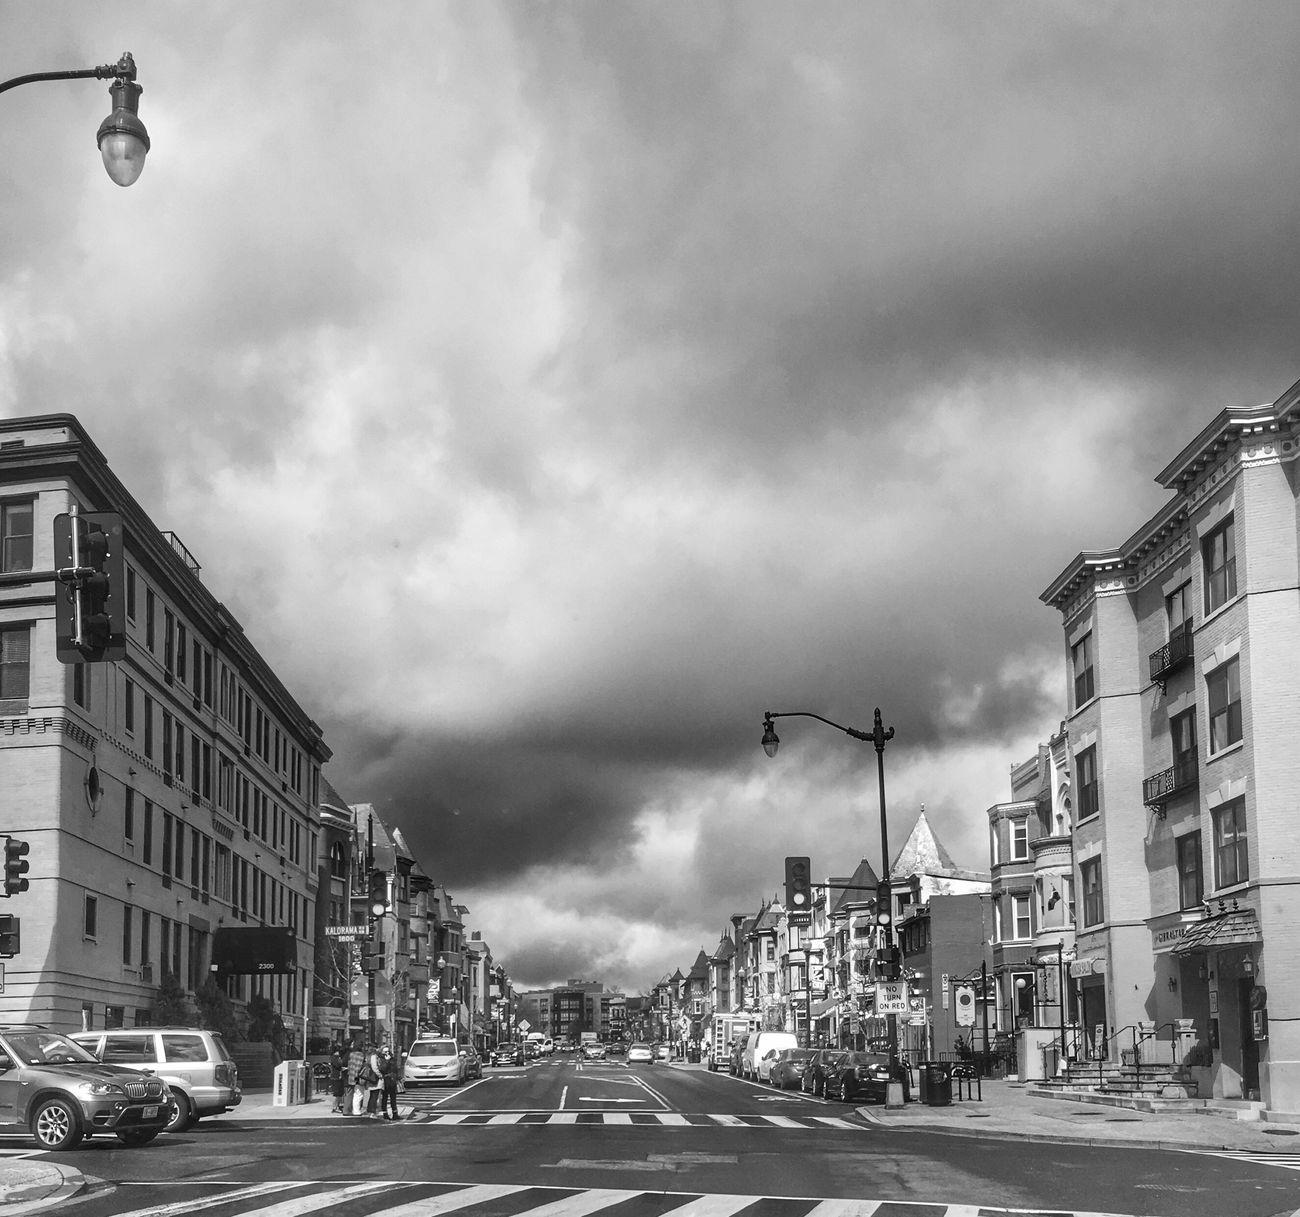 Streetphotography Eye4photography  Bw_collection Blackandwhite Architecture EyeEm Best Shots - Black + White Streetphoto_bw